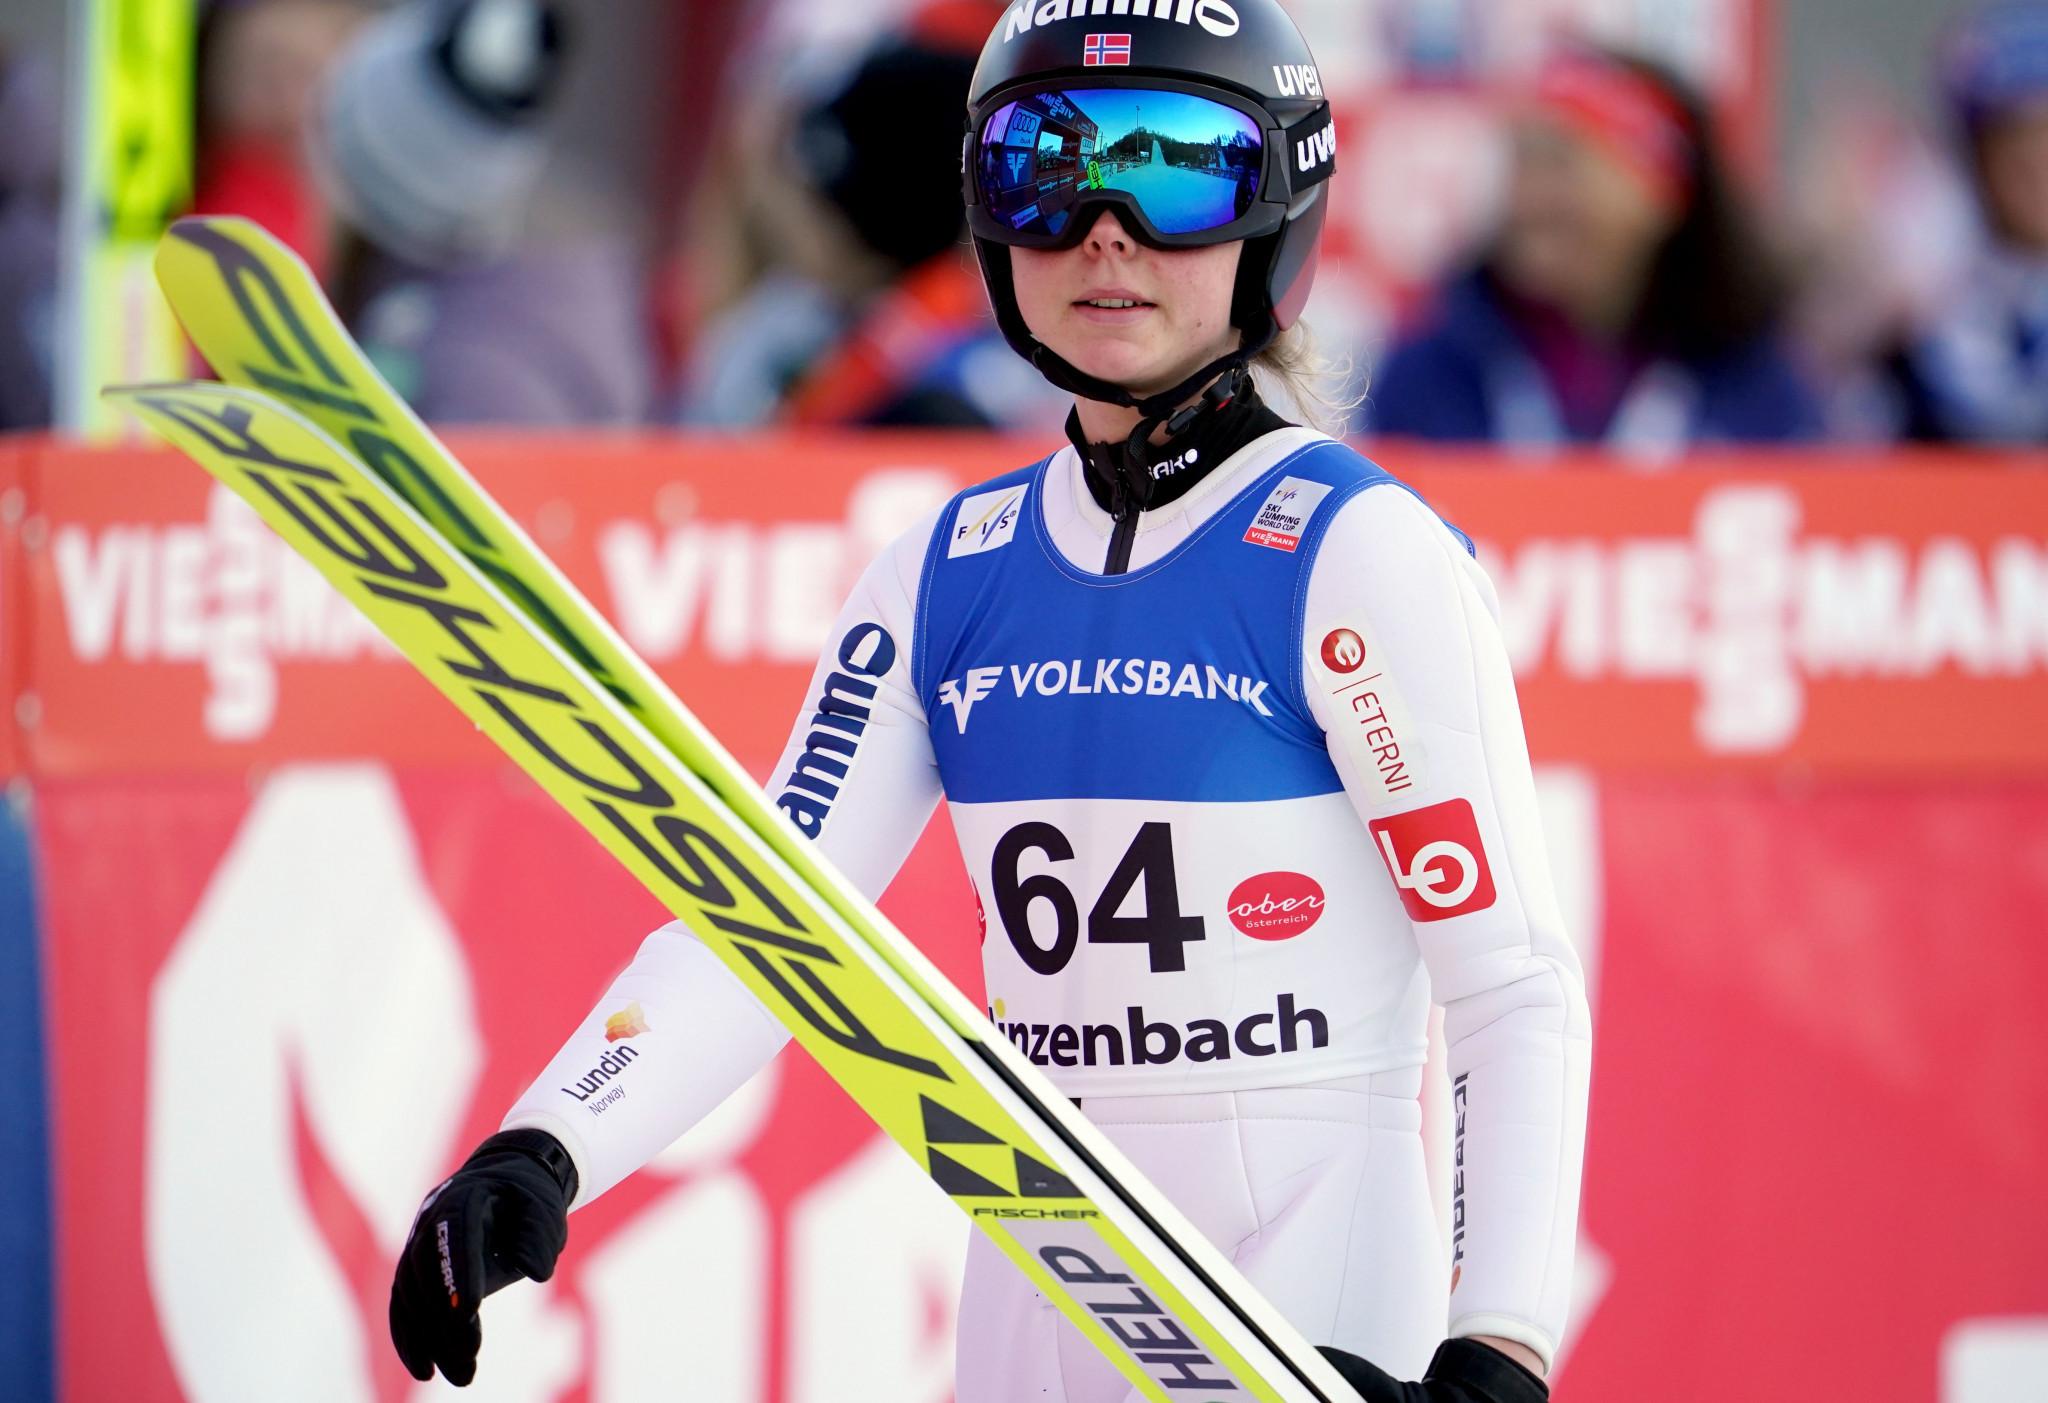 Lundby heads Norwegian ski jumping team for upcoming season